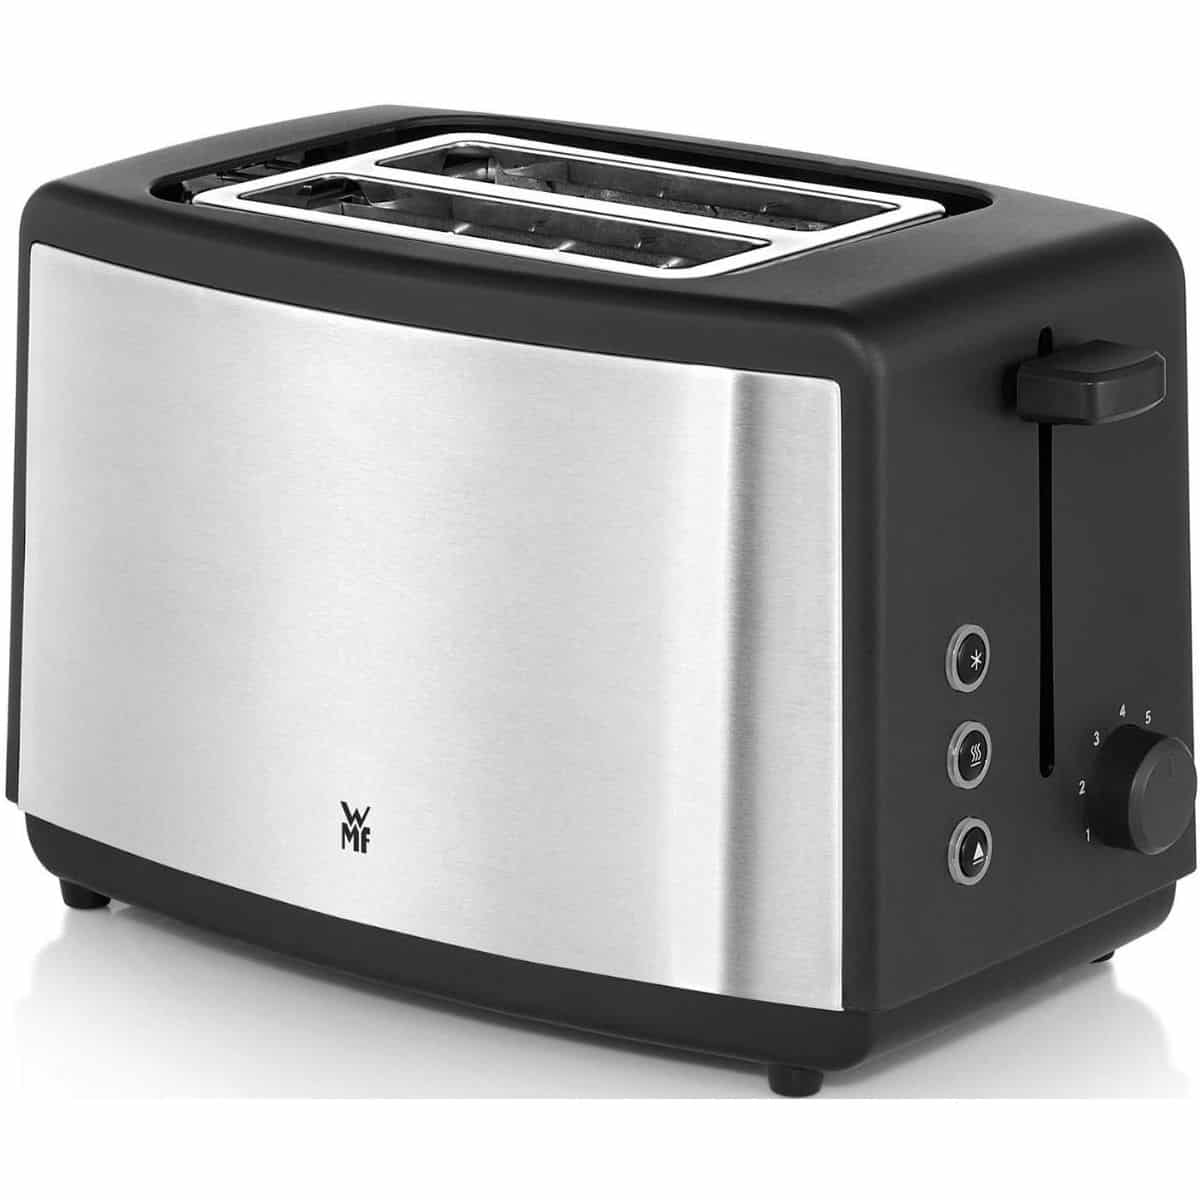 WMF BUENO Toaster